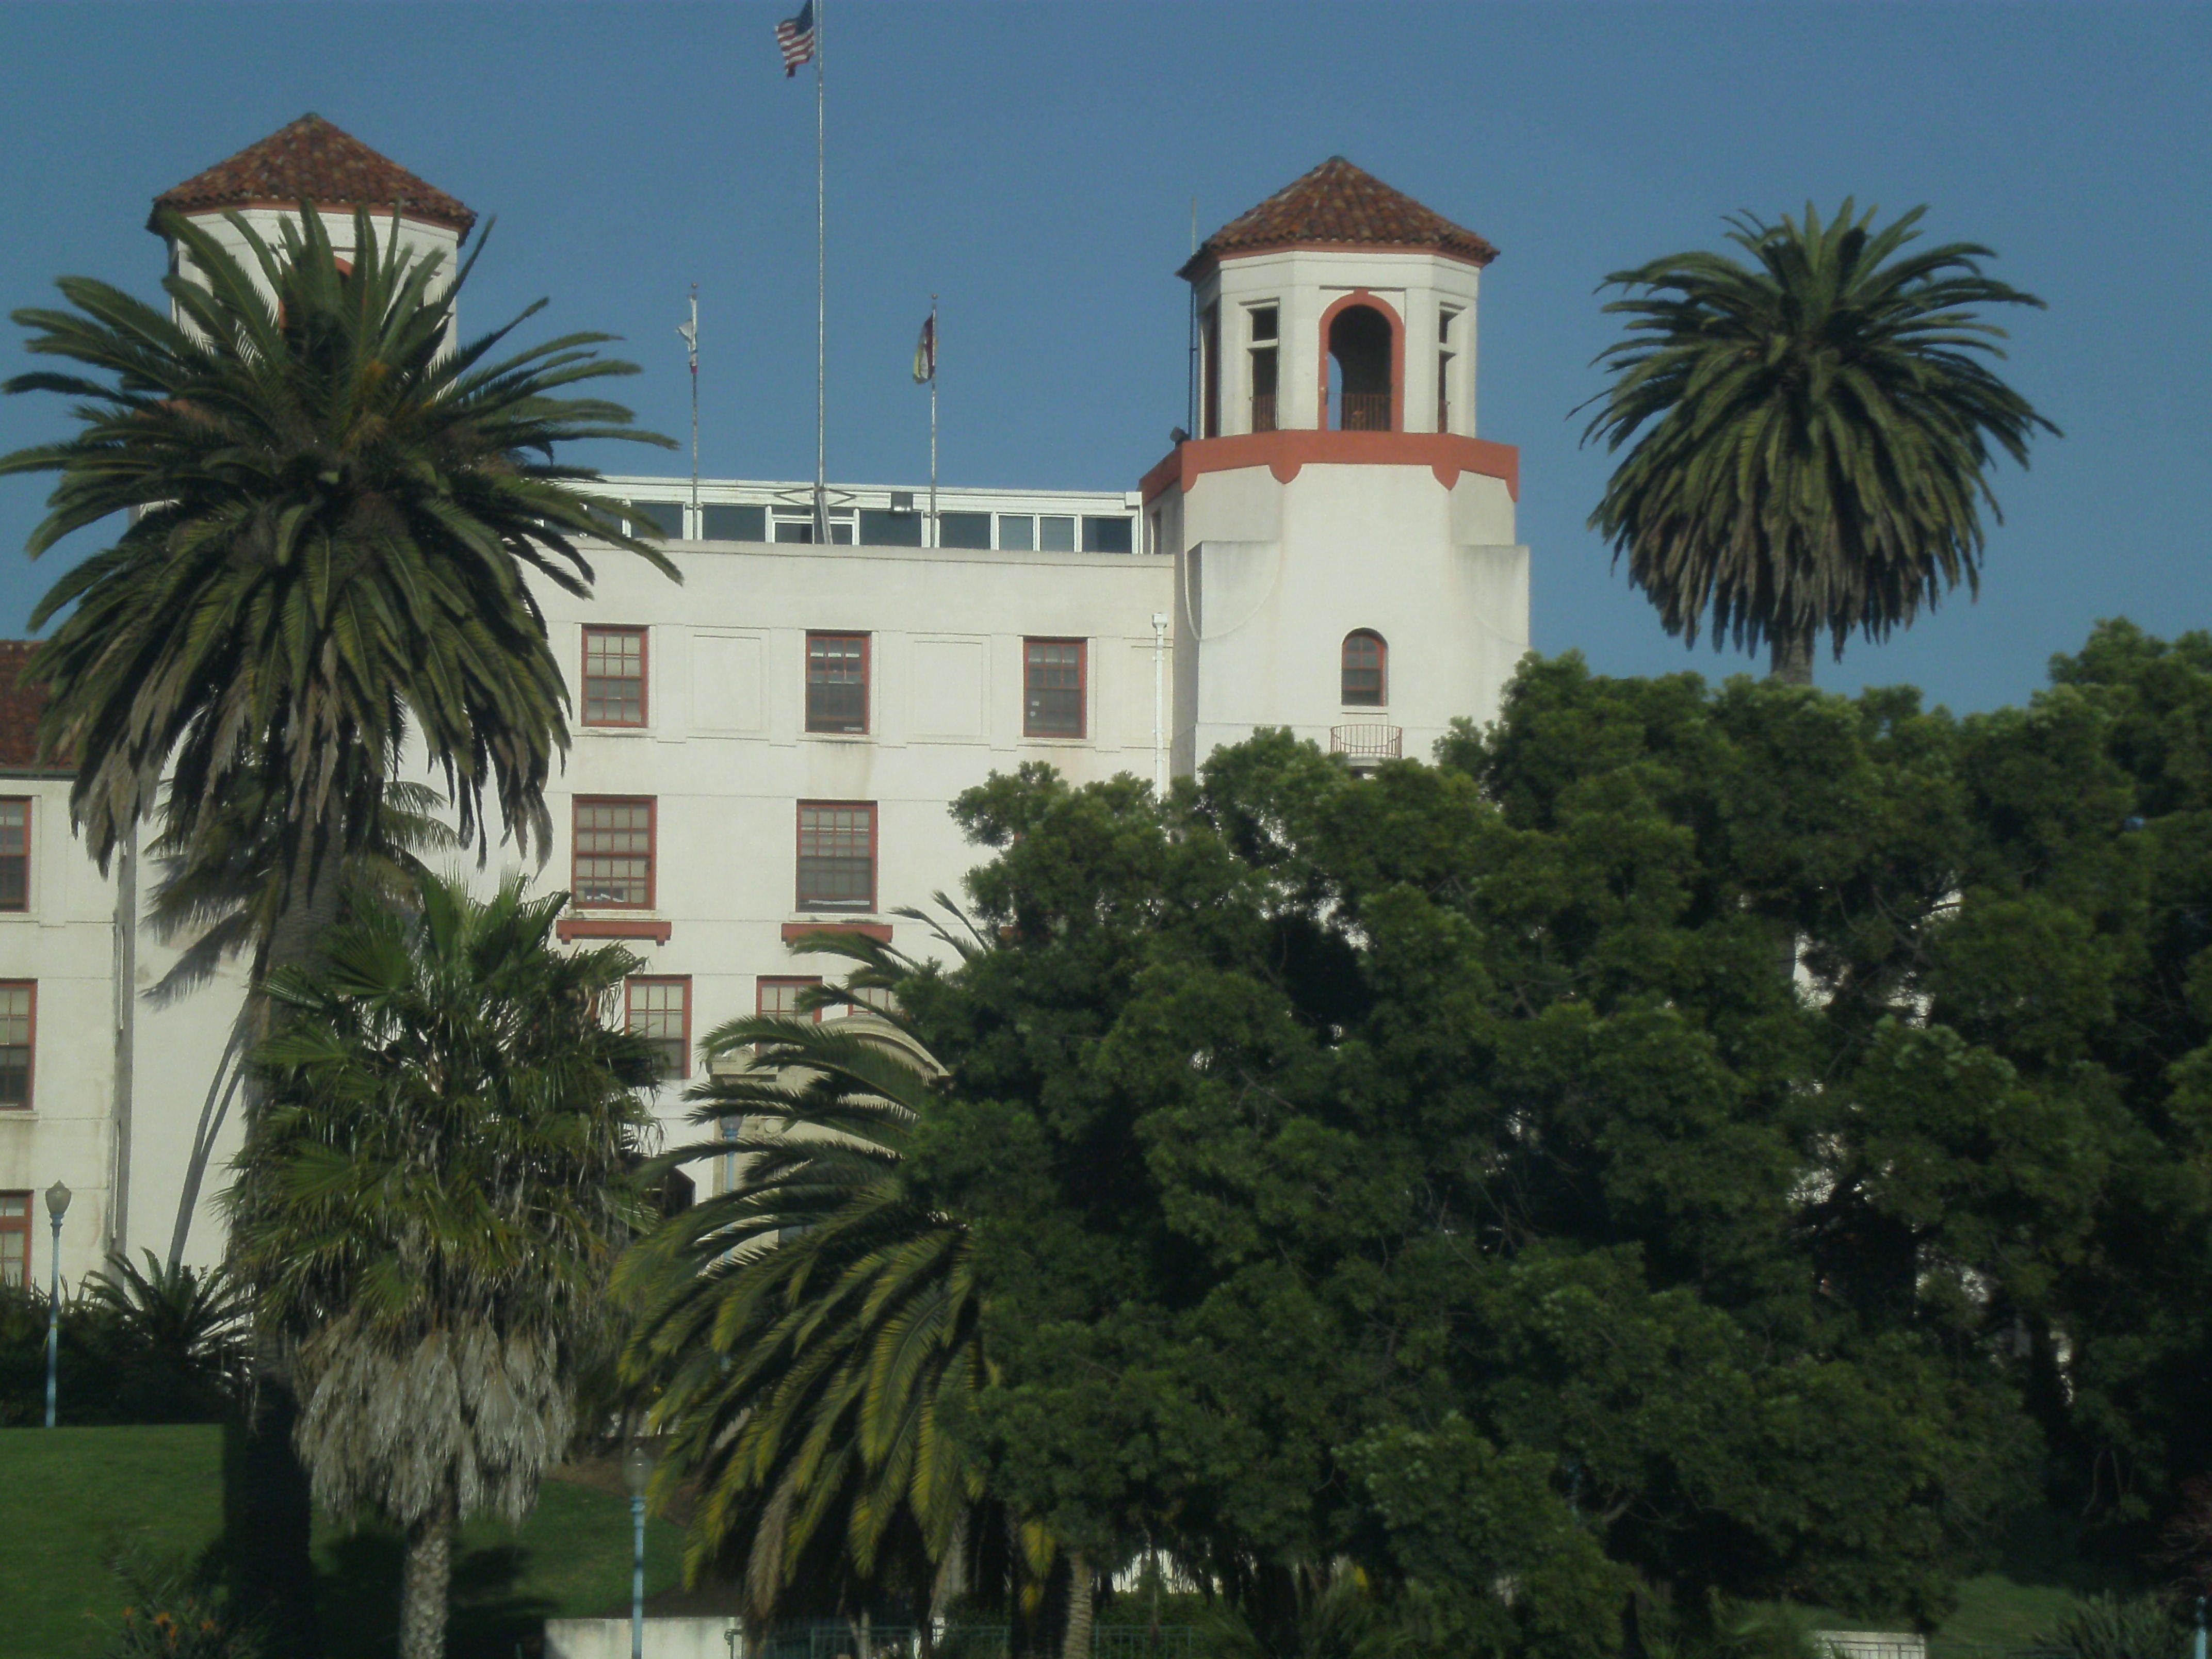 Balboa naval hospital in san diego where i was born